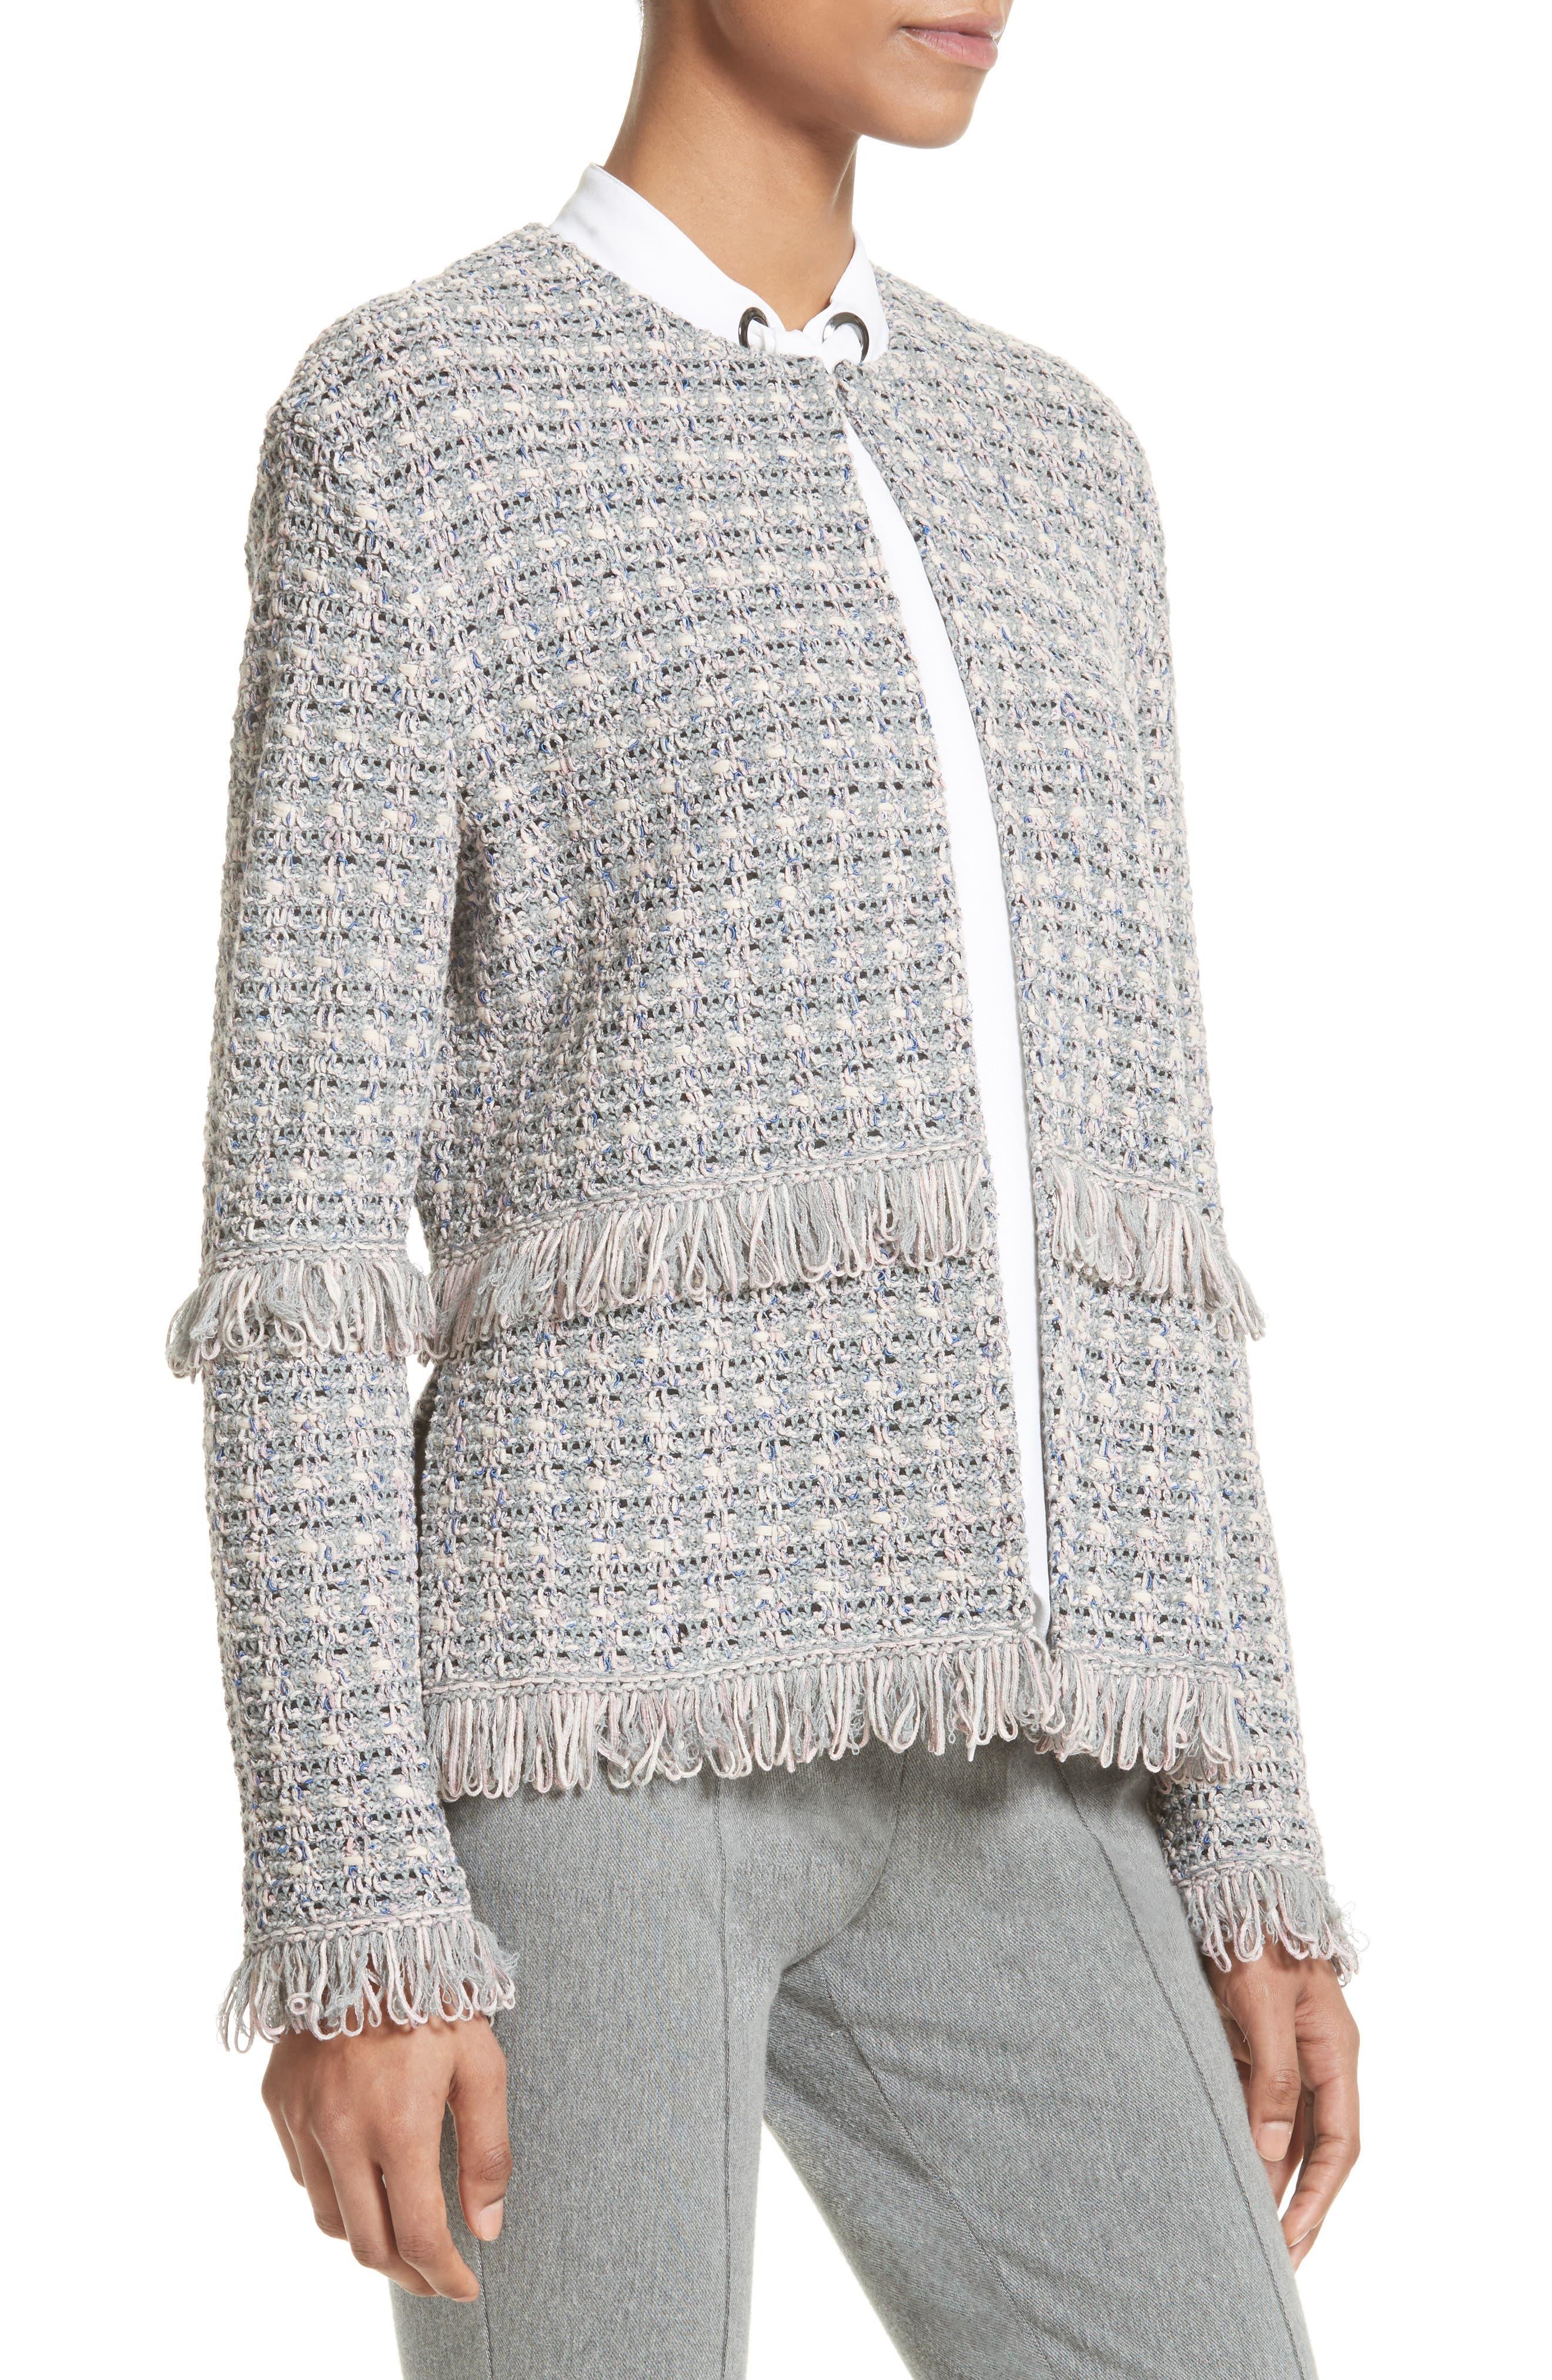 Textural Powder Tweed Jacket,                             Alternate thumbnail 5, color,                             020